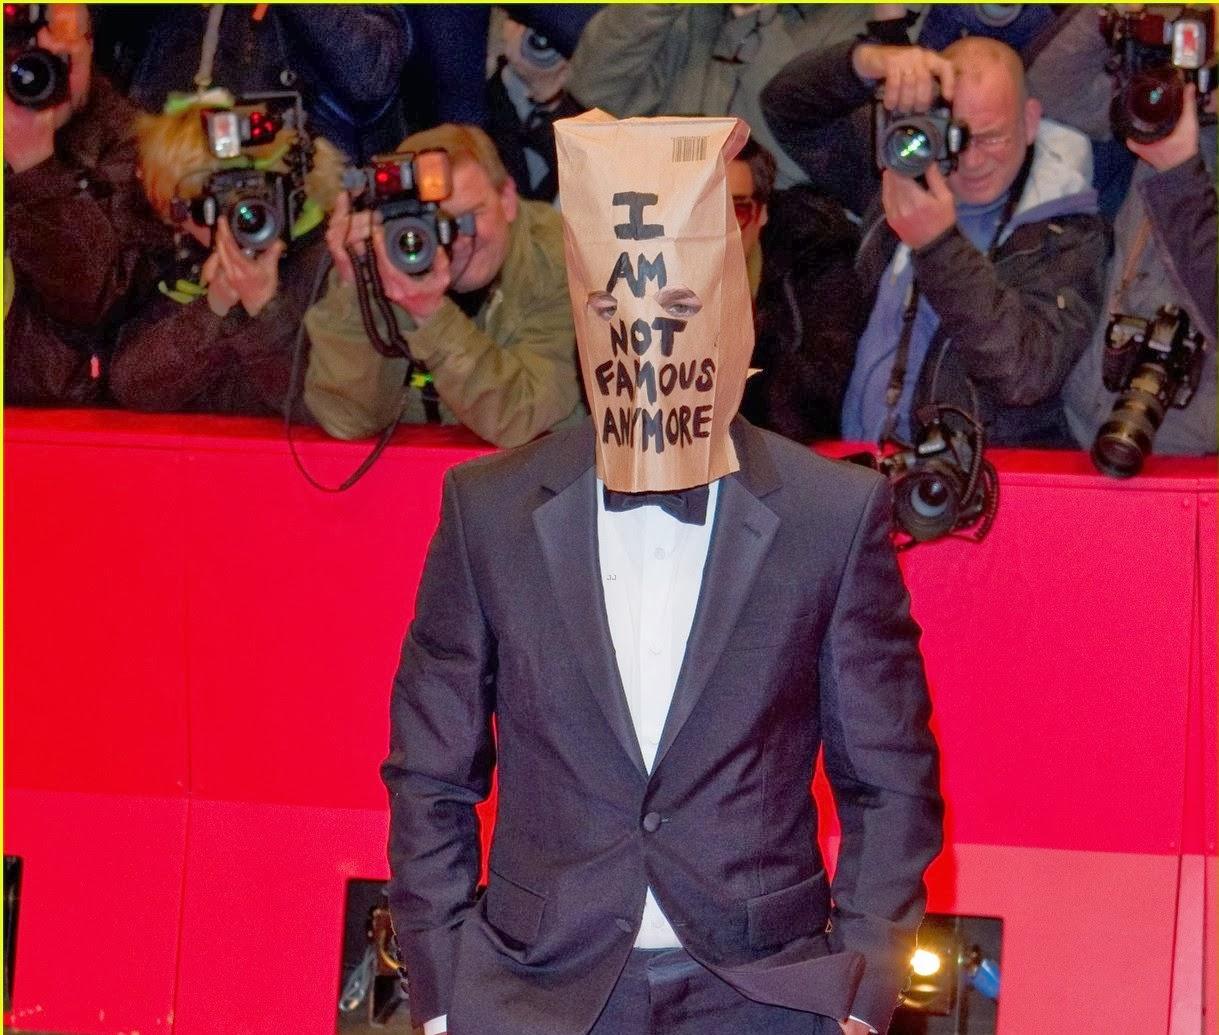 Top 10 Publicity Stunts GONE WRONG - viralnewsbest.com